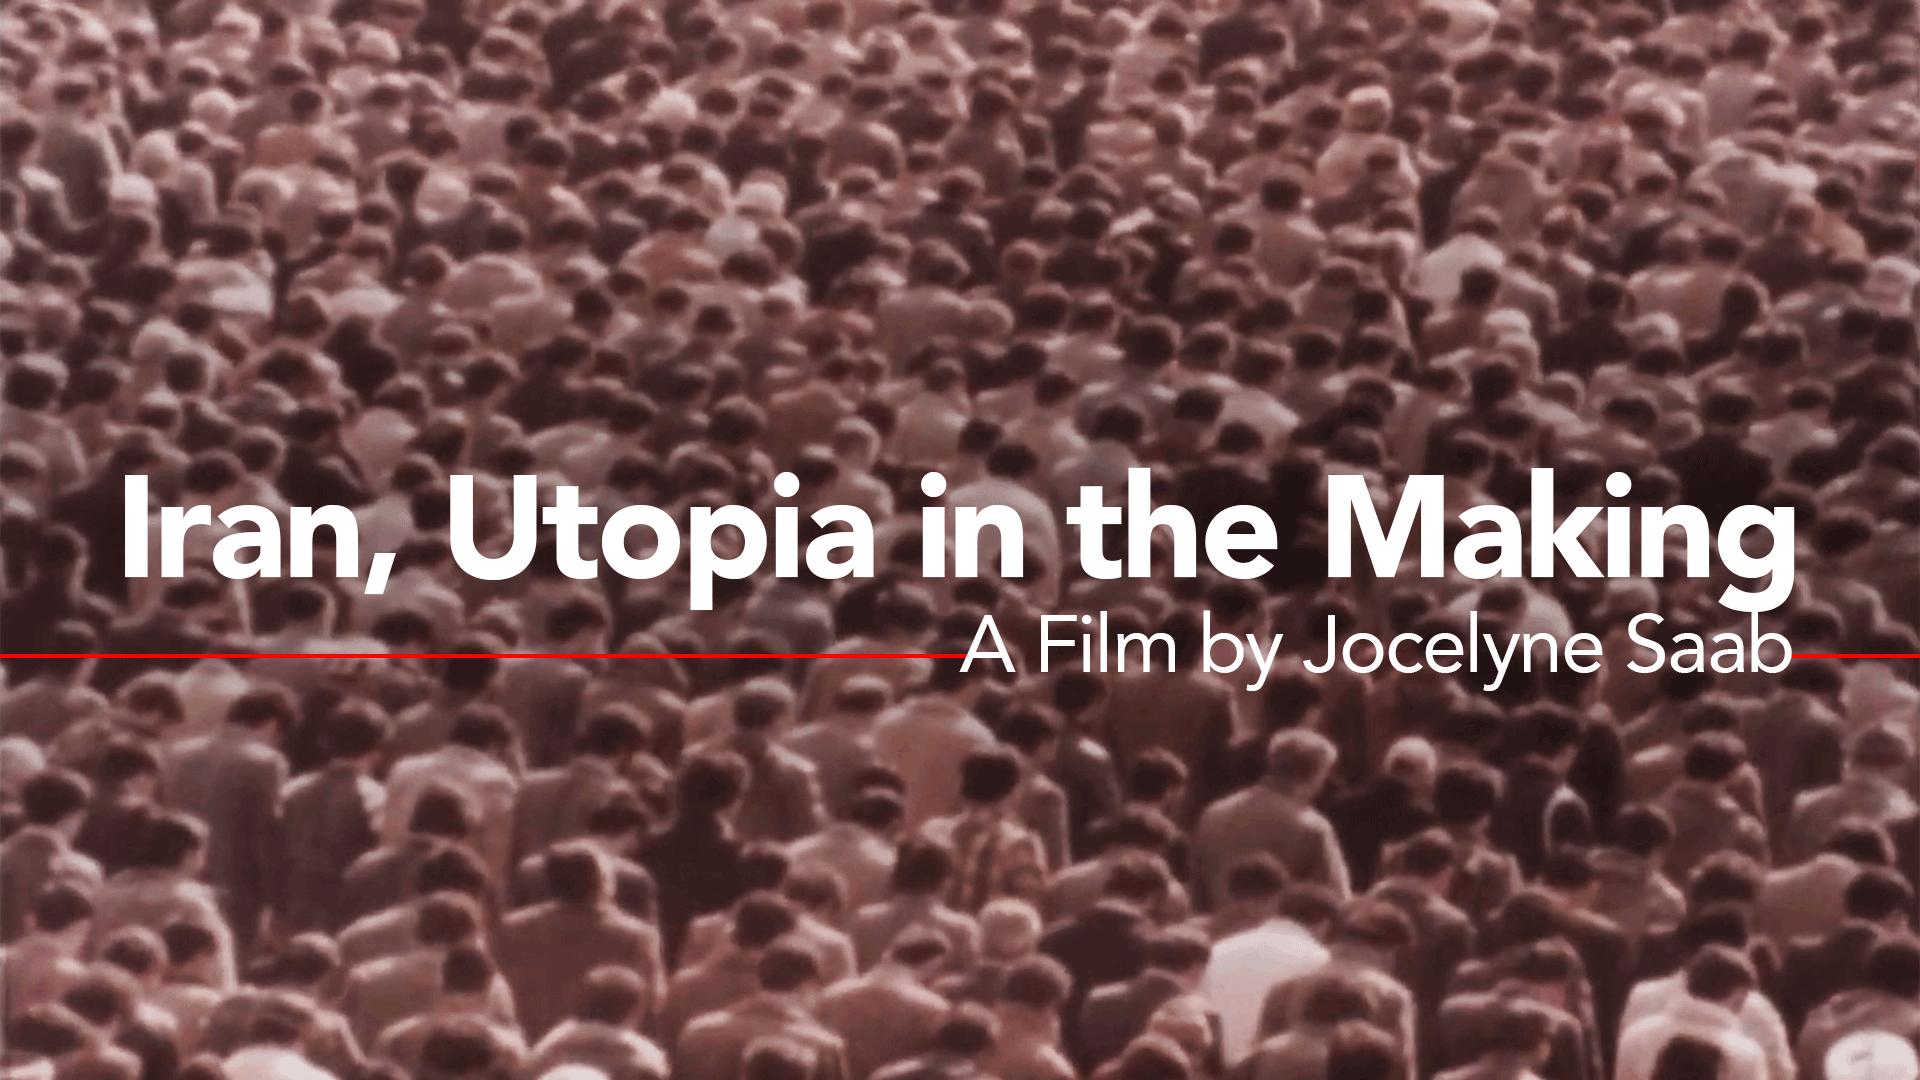 Iran, Utopia in the Making (1980)